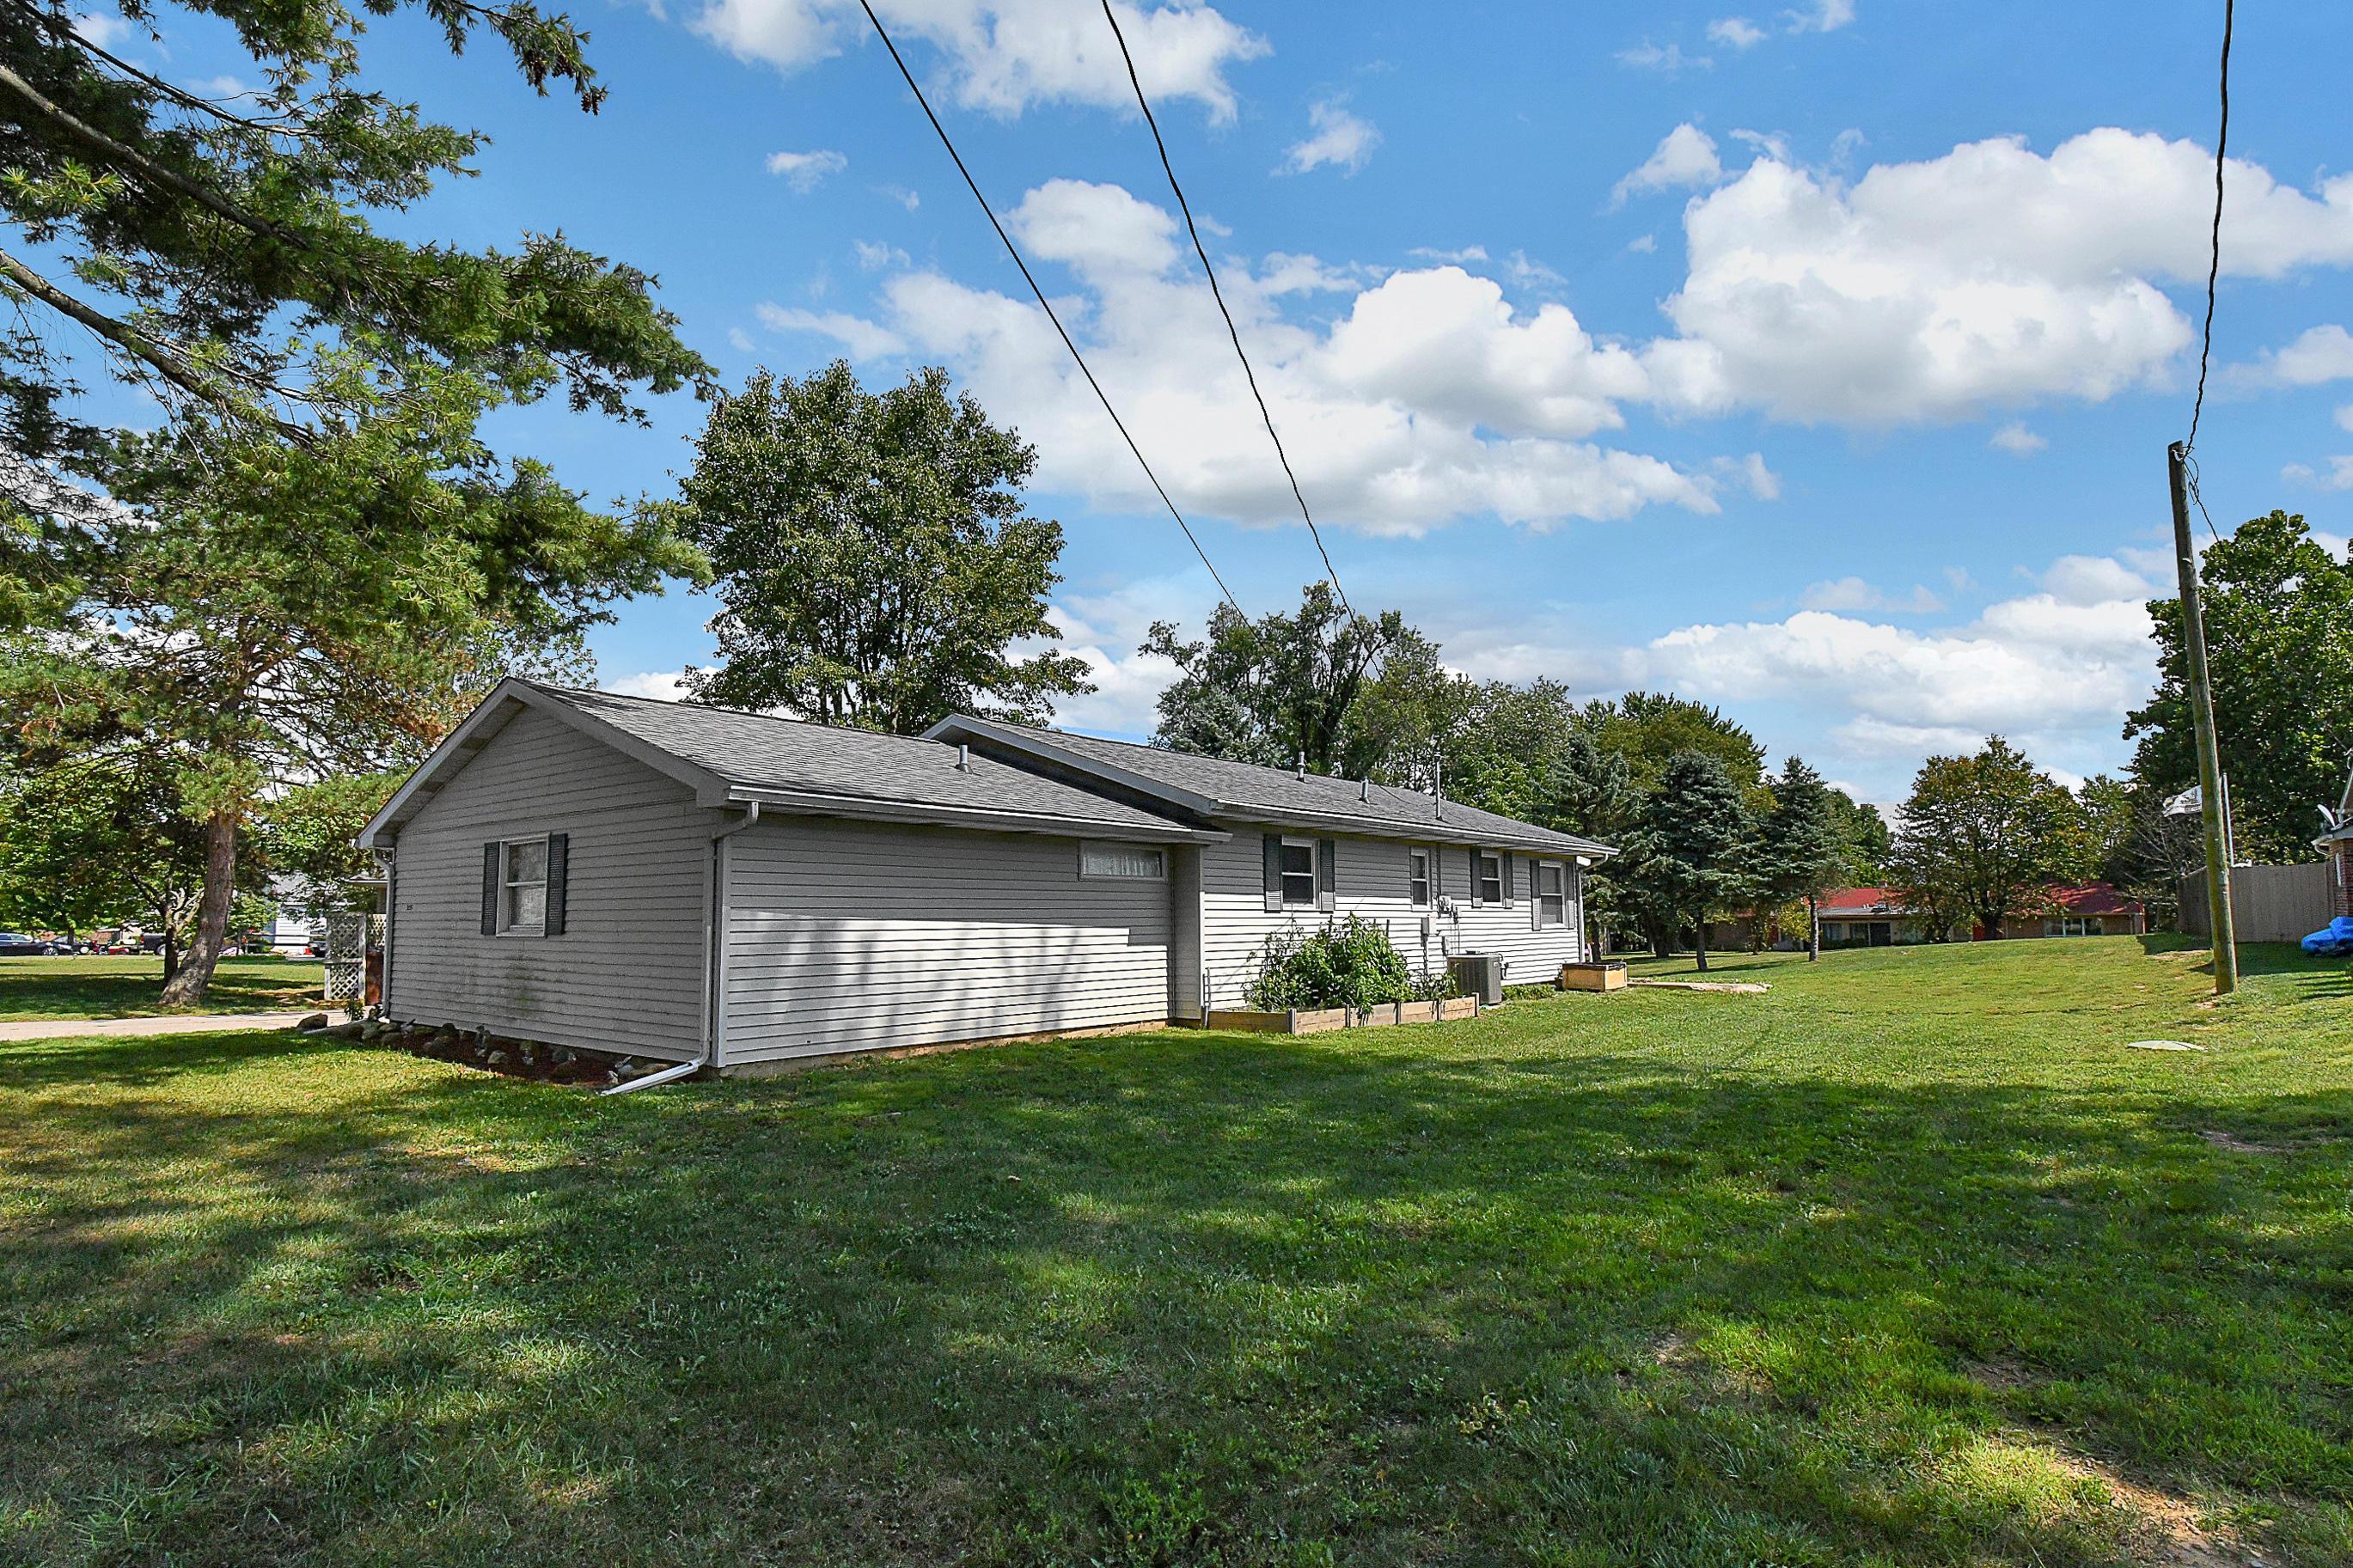 1155 West Choctaw Drive Choctaw Lake Ohi